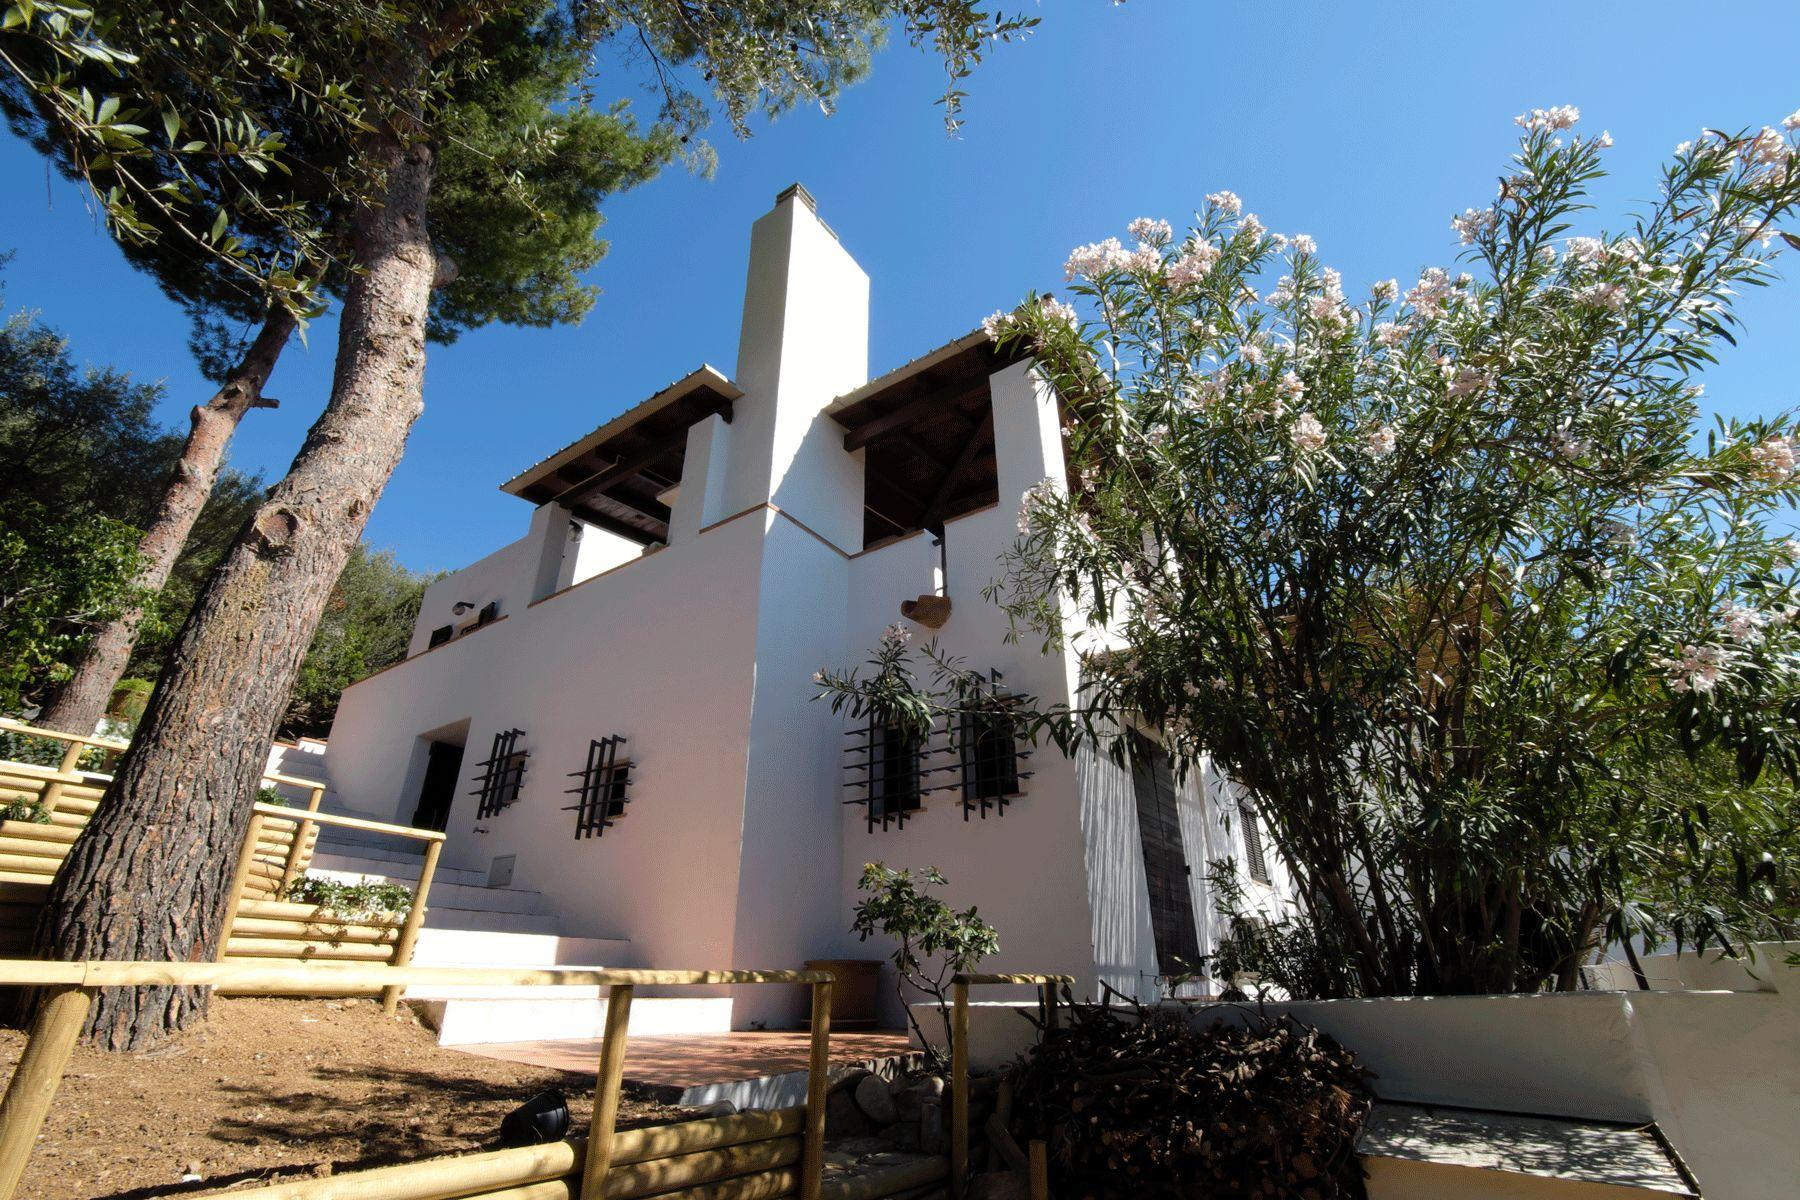 villa mit tradition f r freunde des besonderen. Black Bedroom Furniture Sets. Home Design Ideas